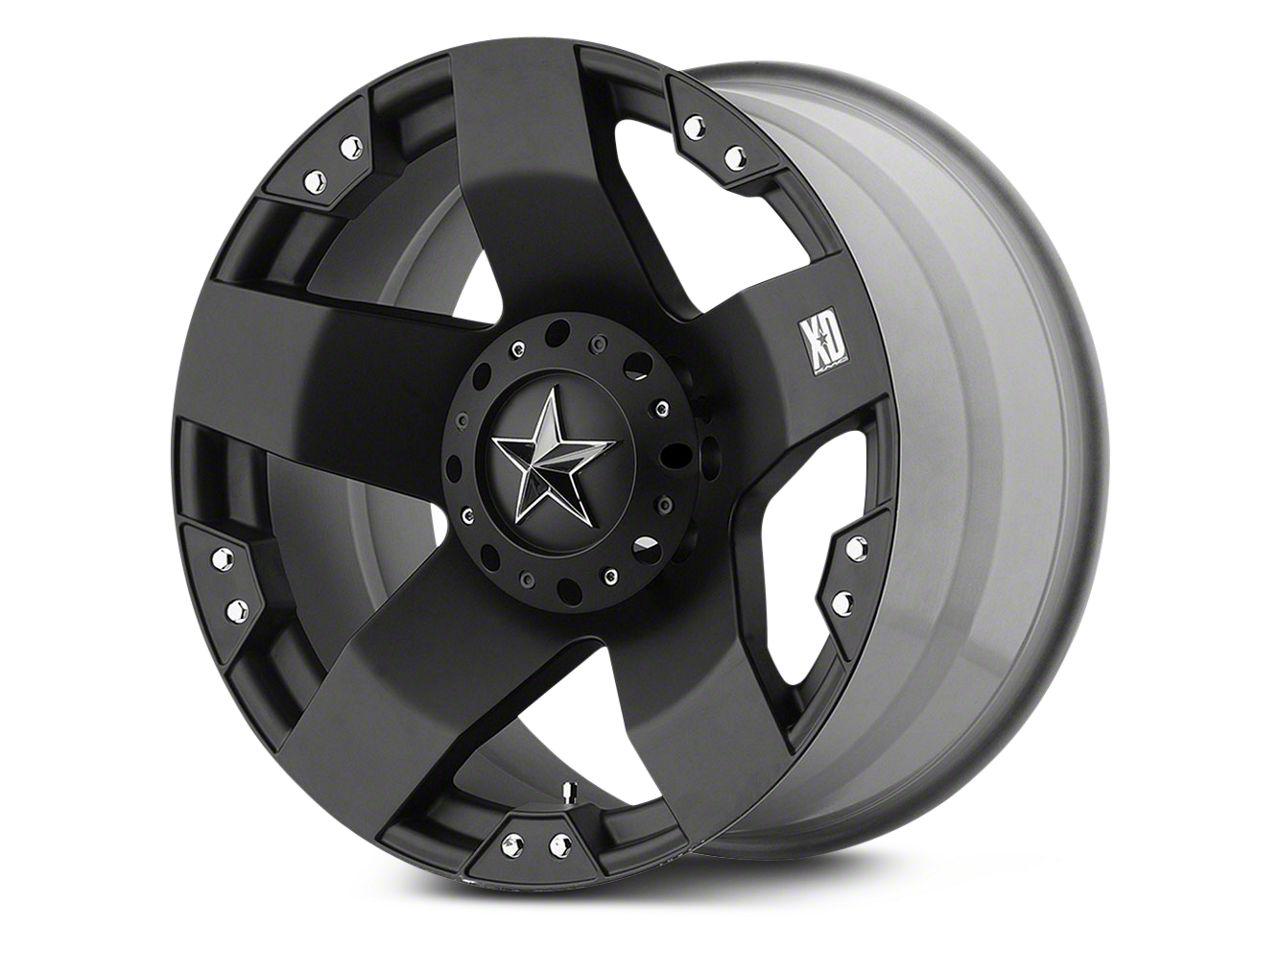 Rockstar XD775 Matte Black 6-Lug Wheel - 22x12 (07-18 Sierra 1500)